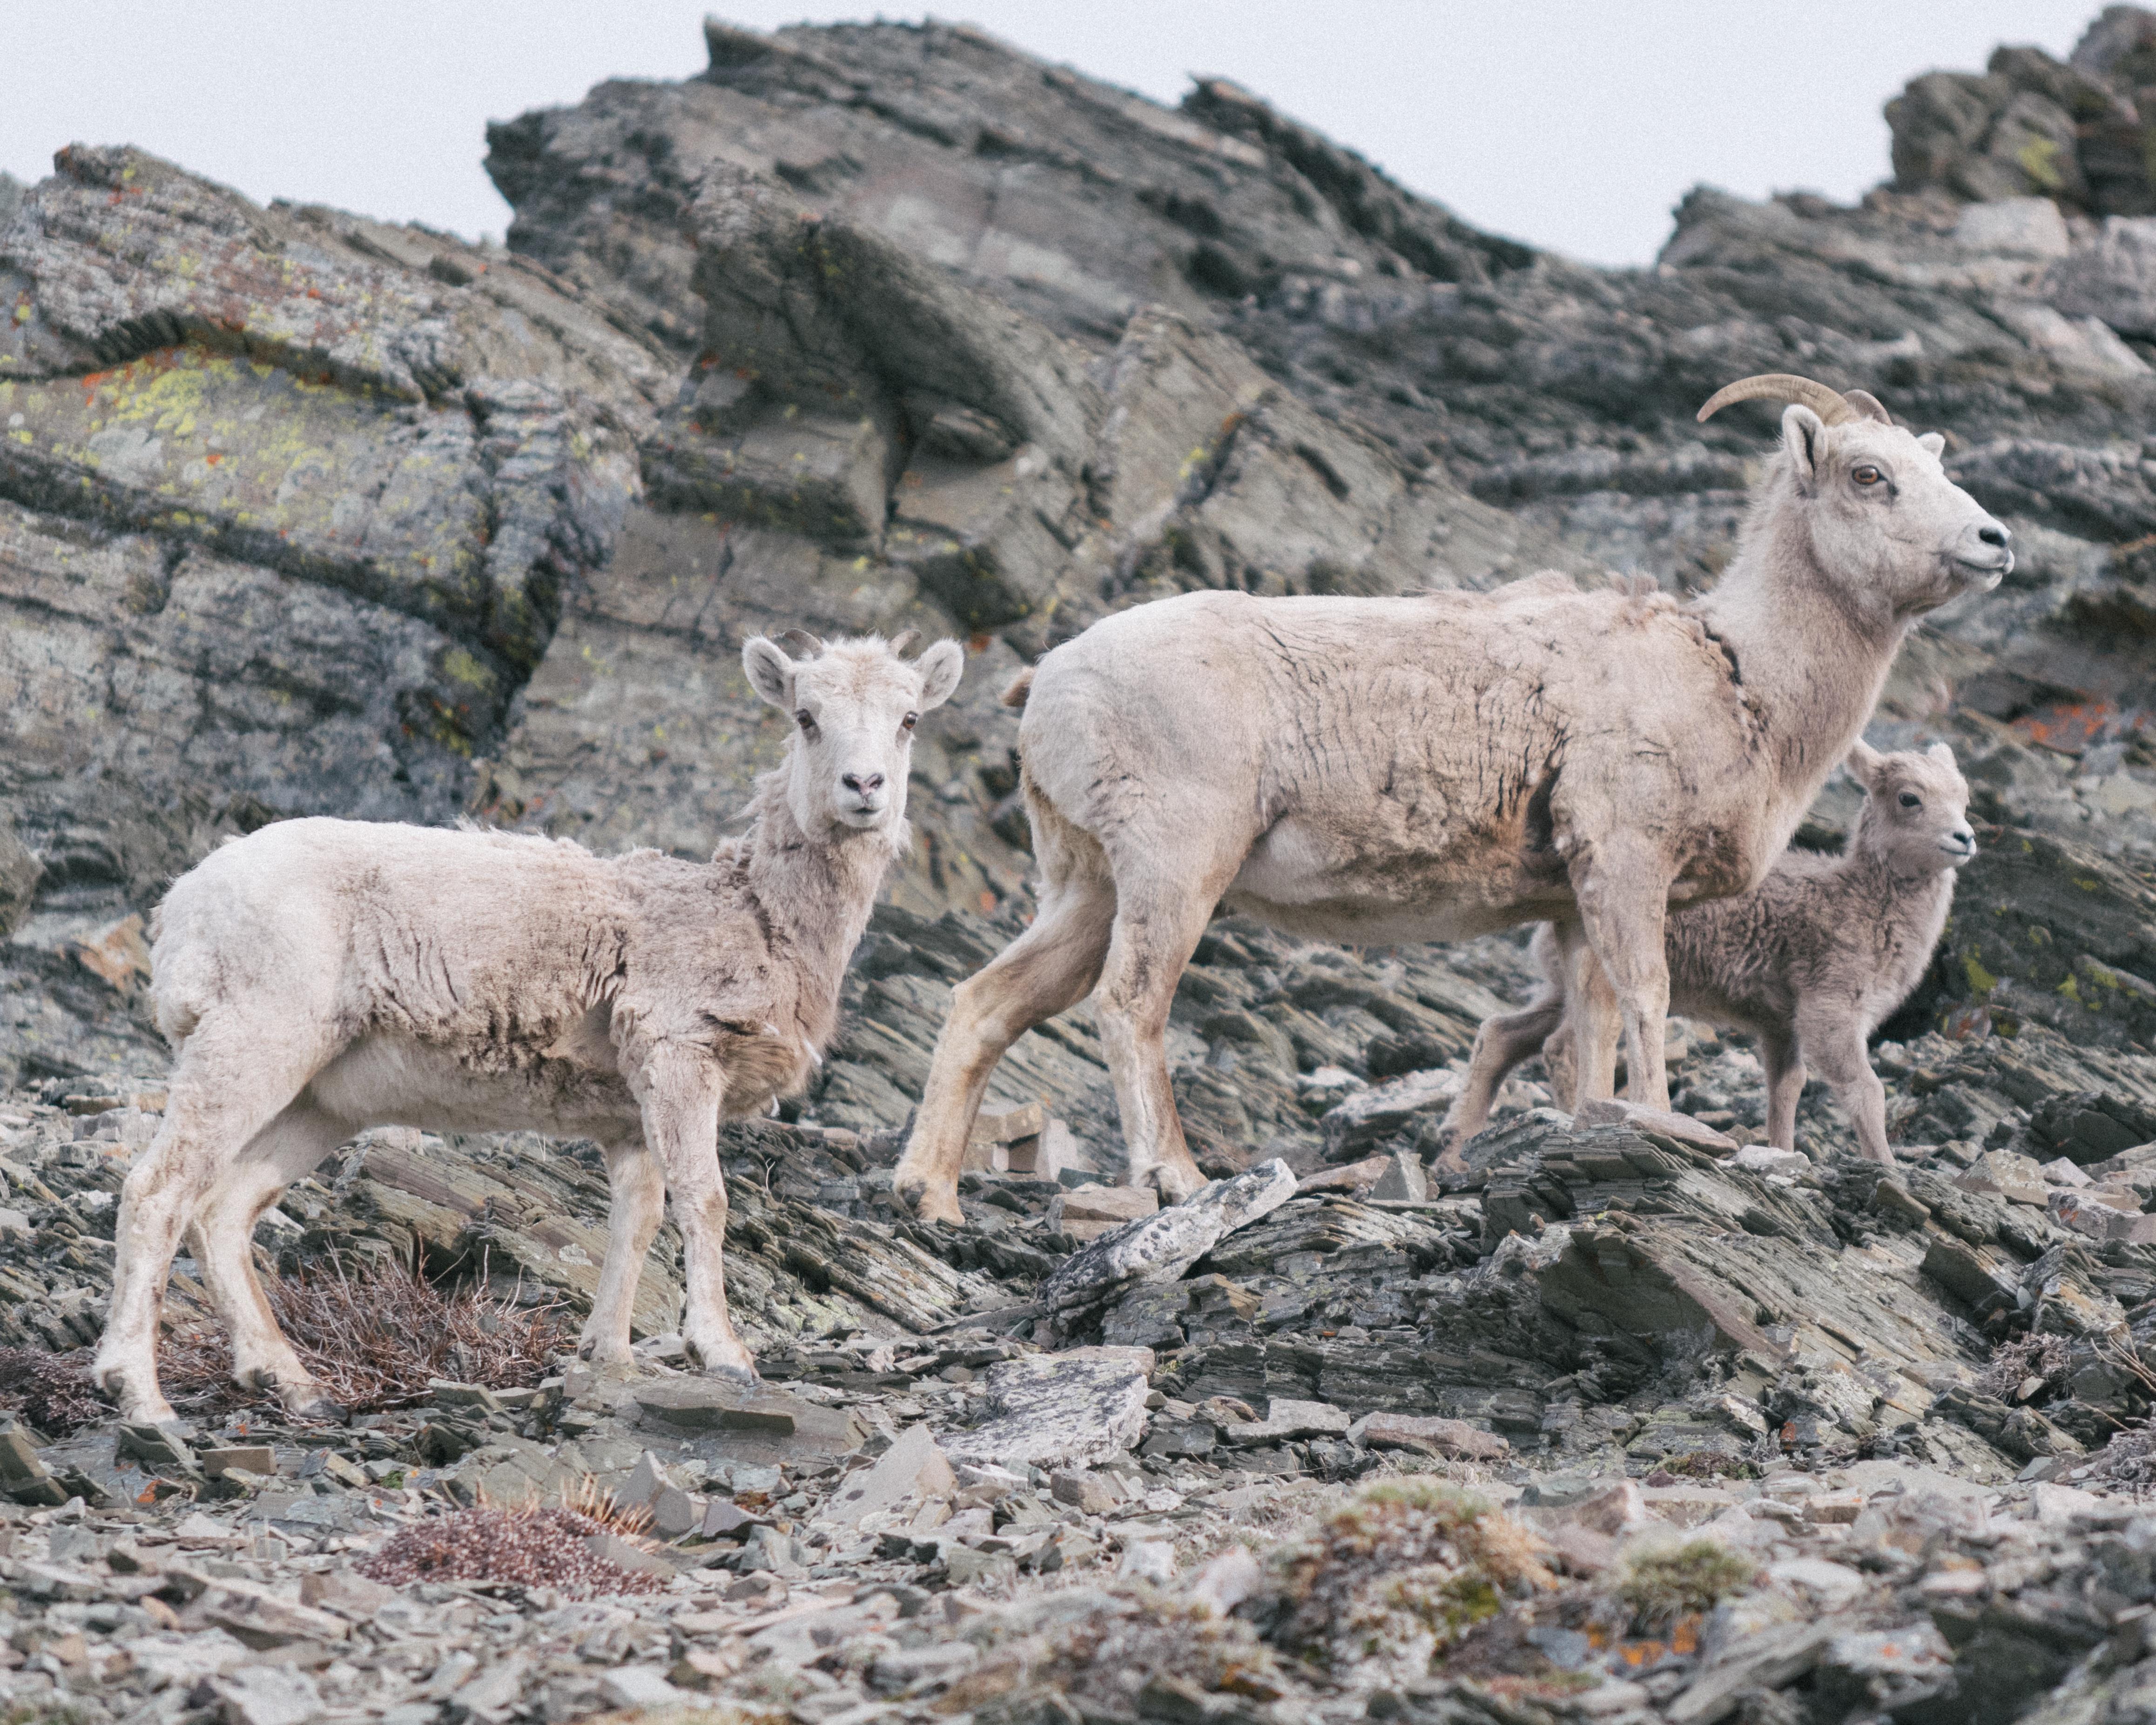 Wild goats, mountains, animals, wild, goats, horns, white, hooves, cliff, cliff, climbing, trapadas